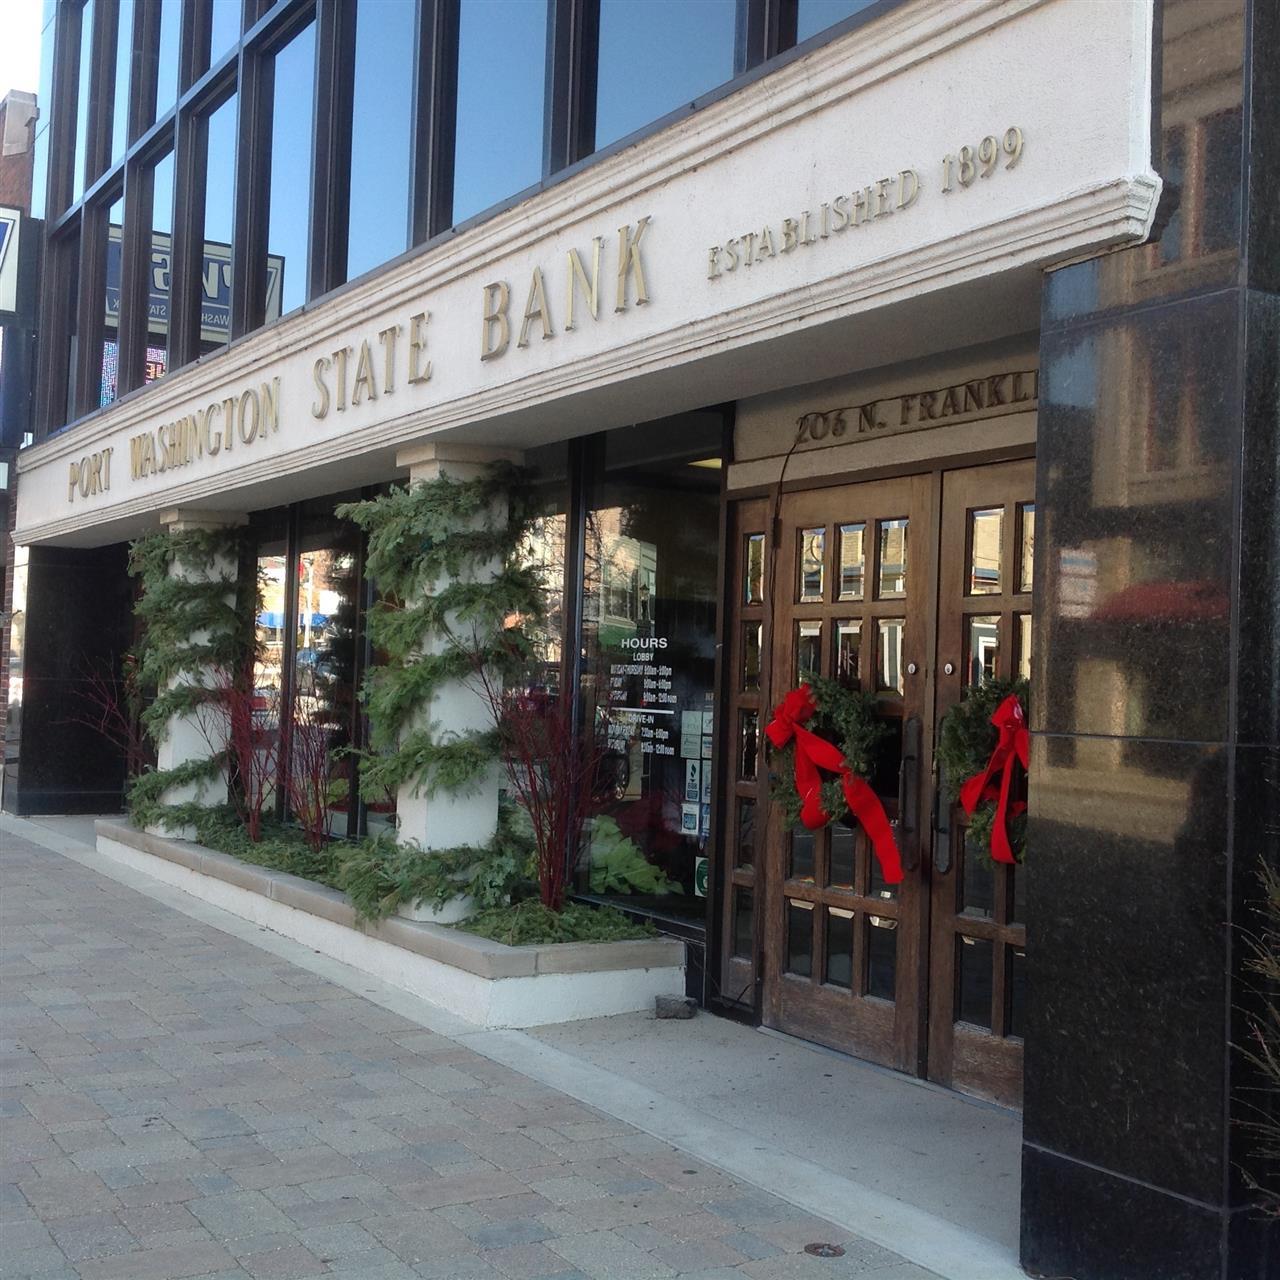 Port Washington State Bank Holiday decorations